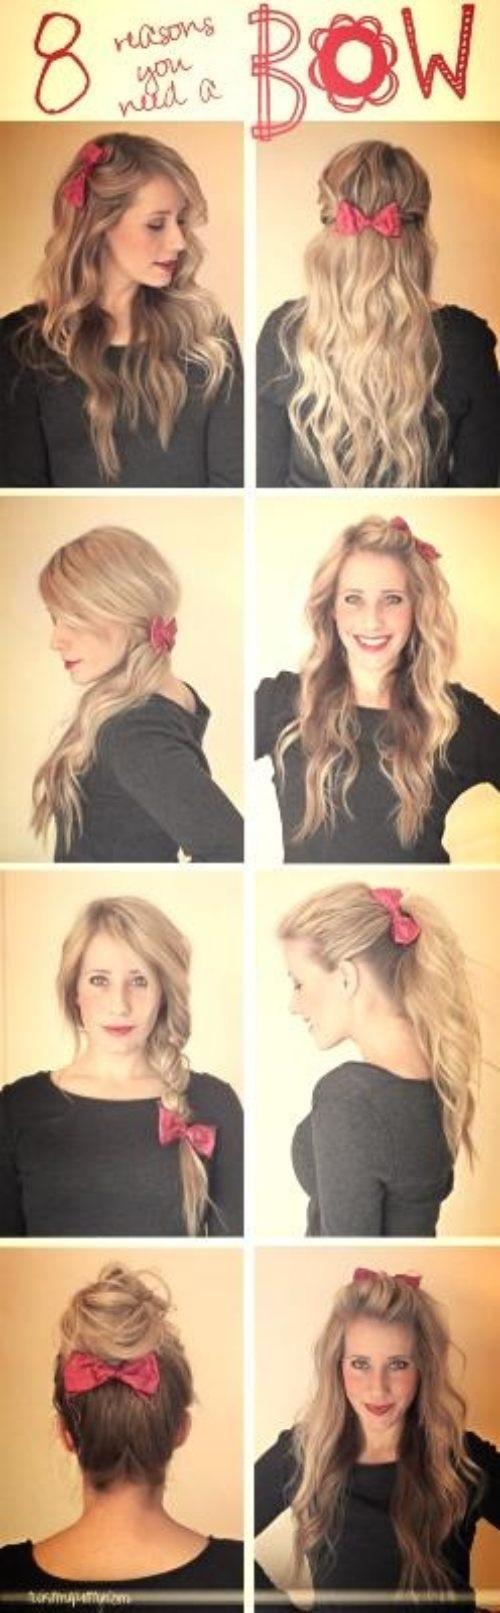 coiffure-printemps-10